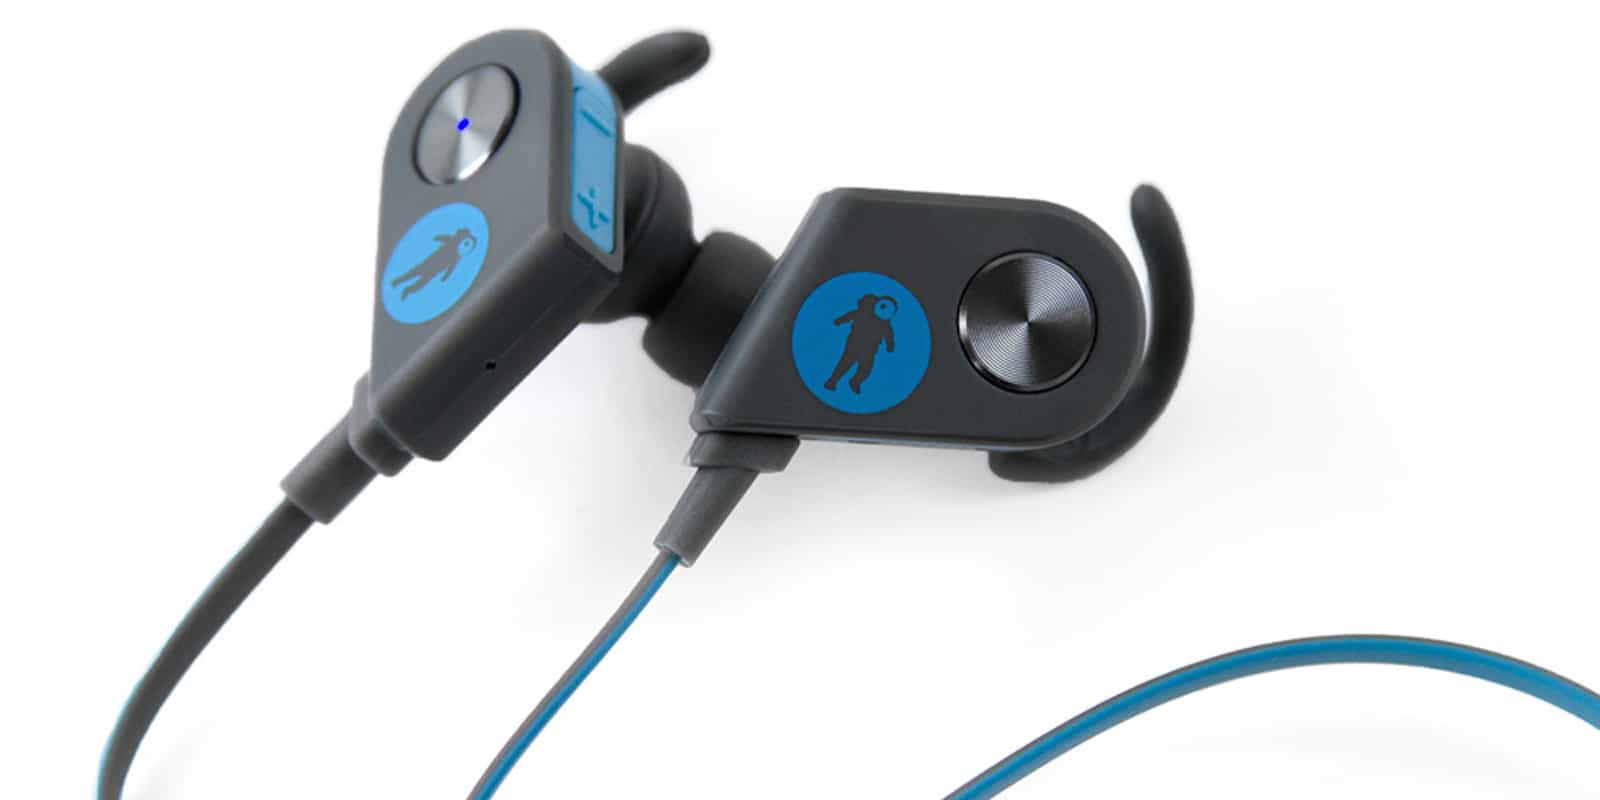 CoM - FRESHeBUDS Pro Magnetic Bluetooth Earbuds